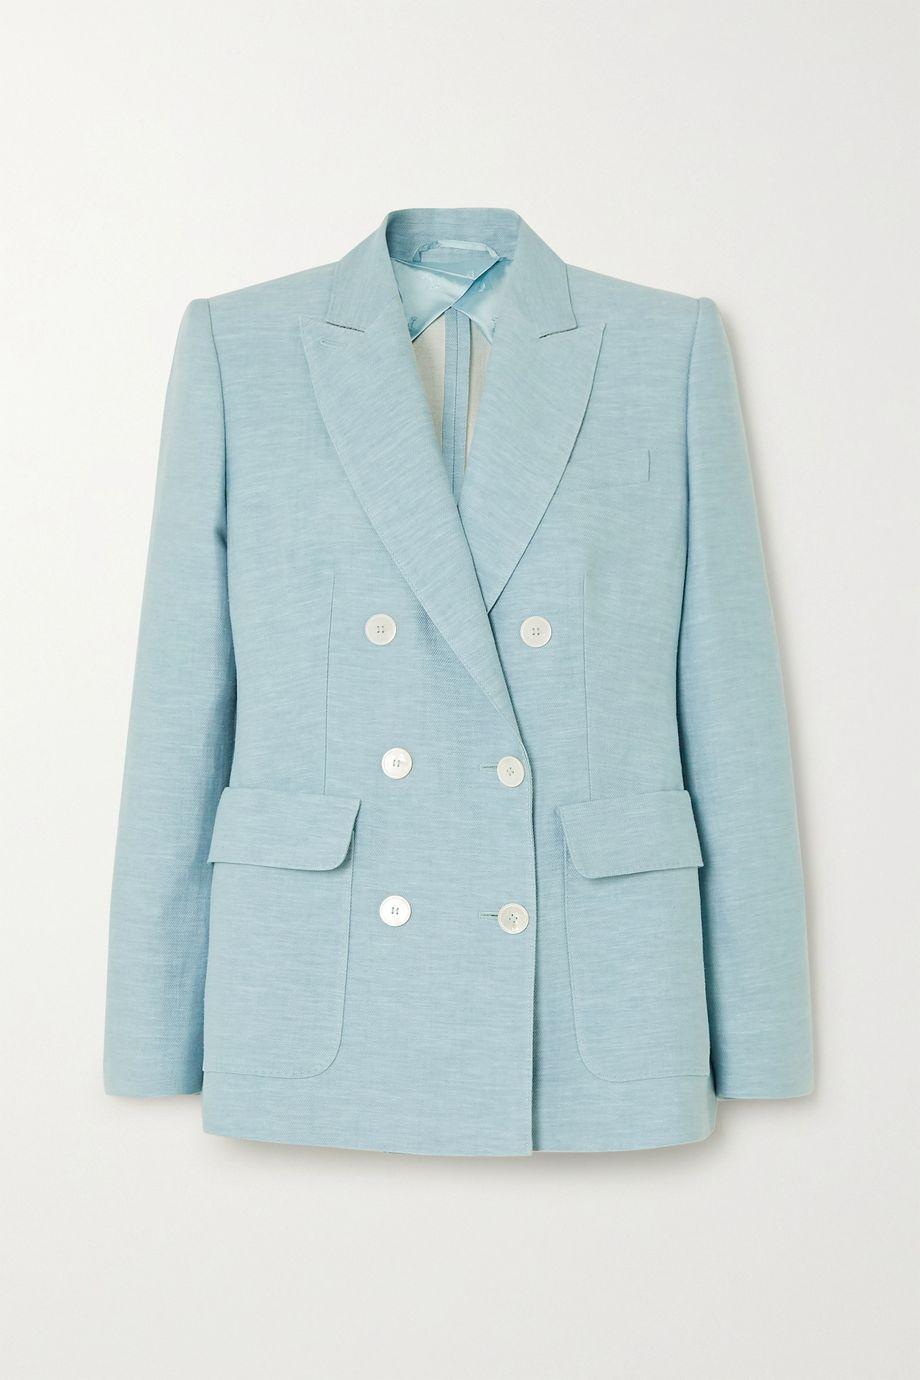 Max Mara Ottuso double-breasted linen and silk-blend blazer